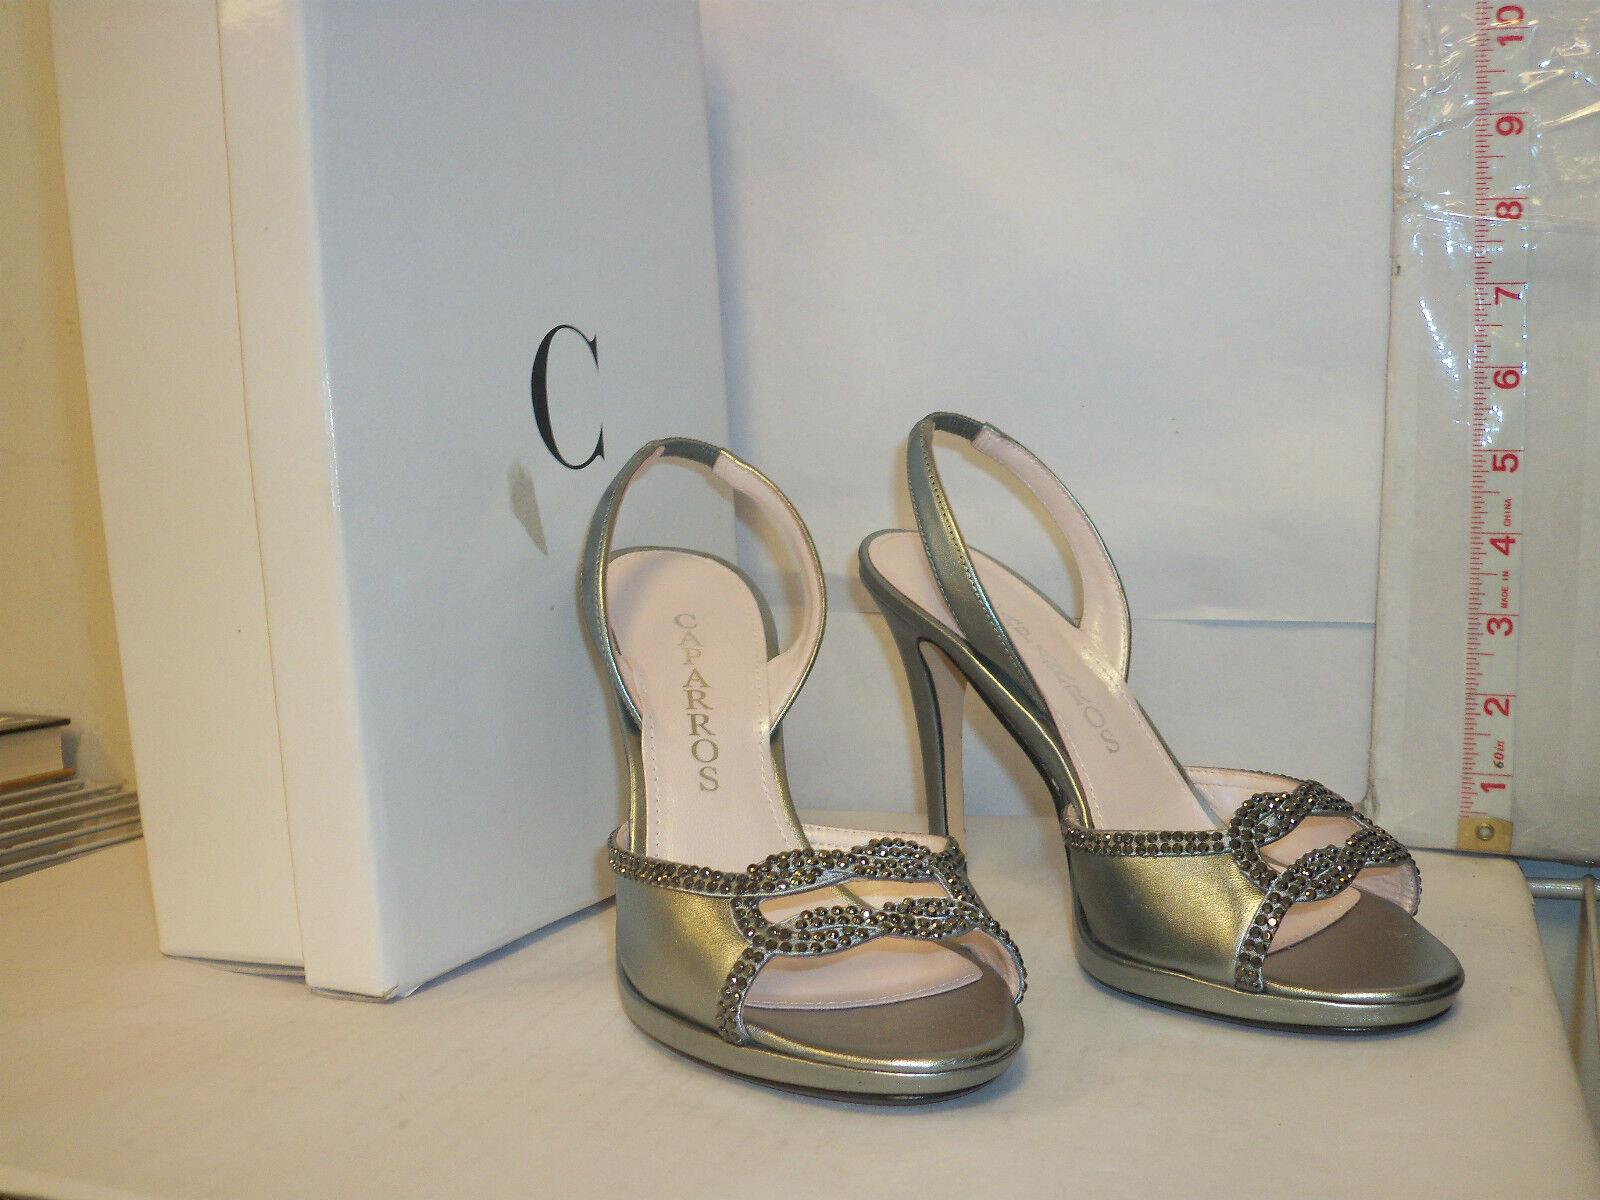 Caparros New Womens Winnie Mecury Metallic Slingback Heels 6 M shoes